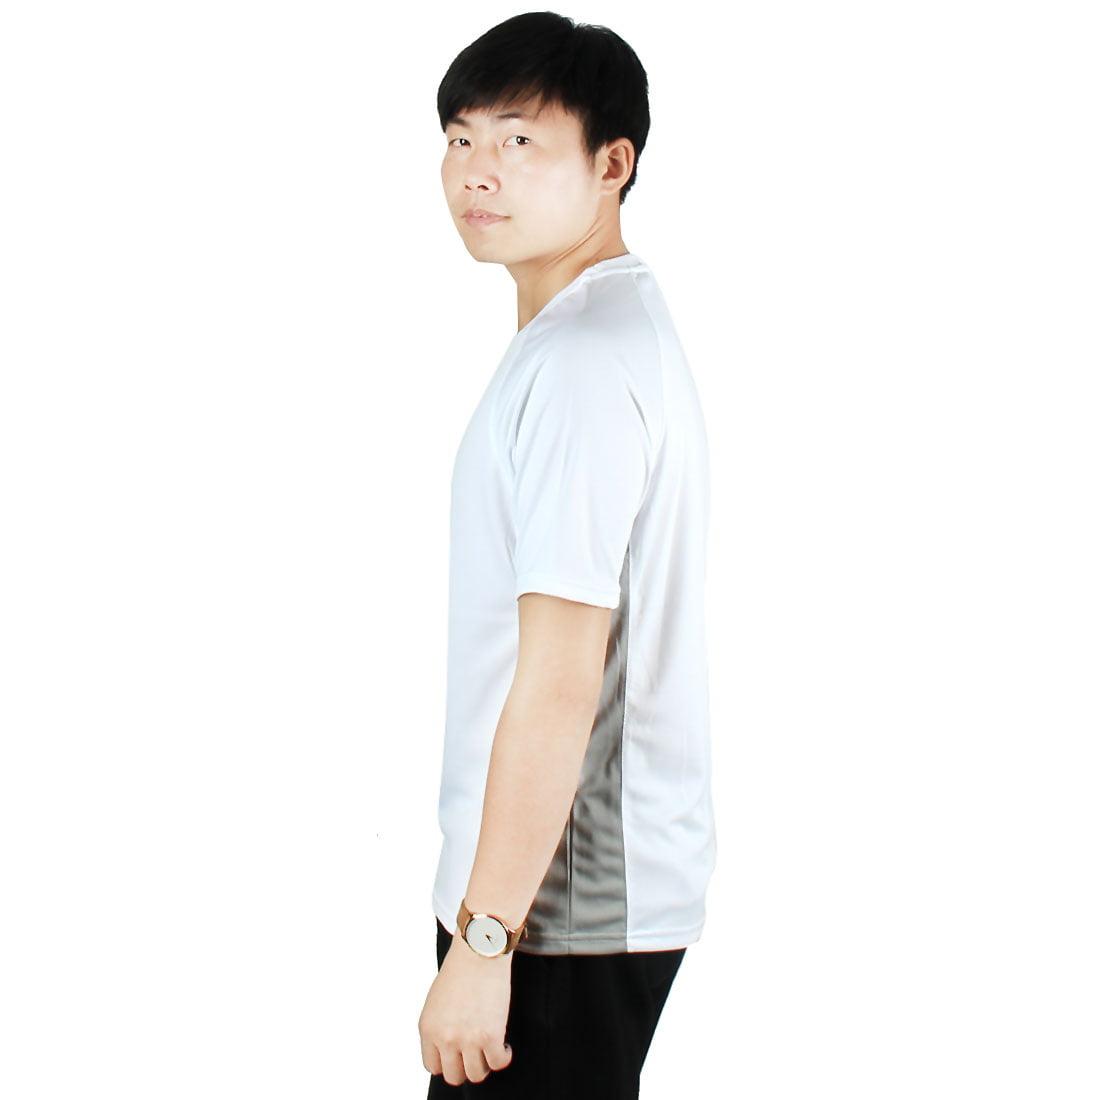 Men Exercise Marathon Polyester Short Sleeve Sports T-shirt White L/L (US 42) - image 5 de 6